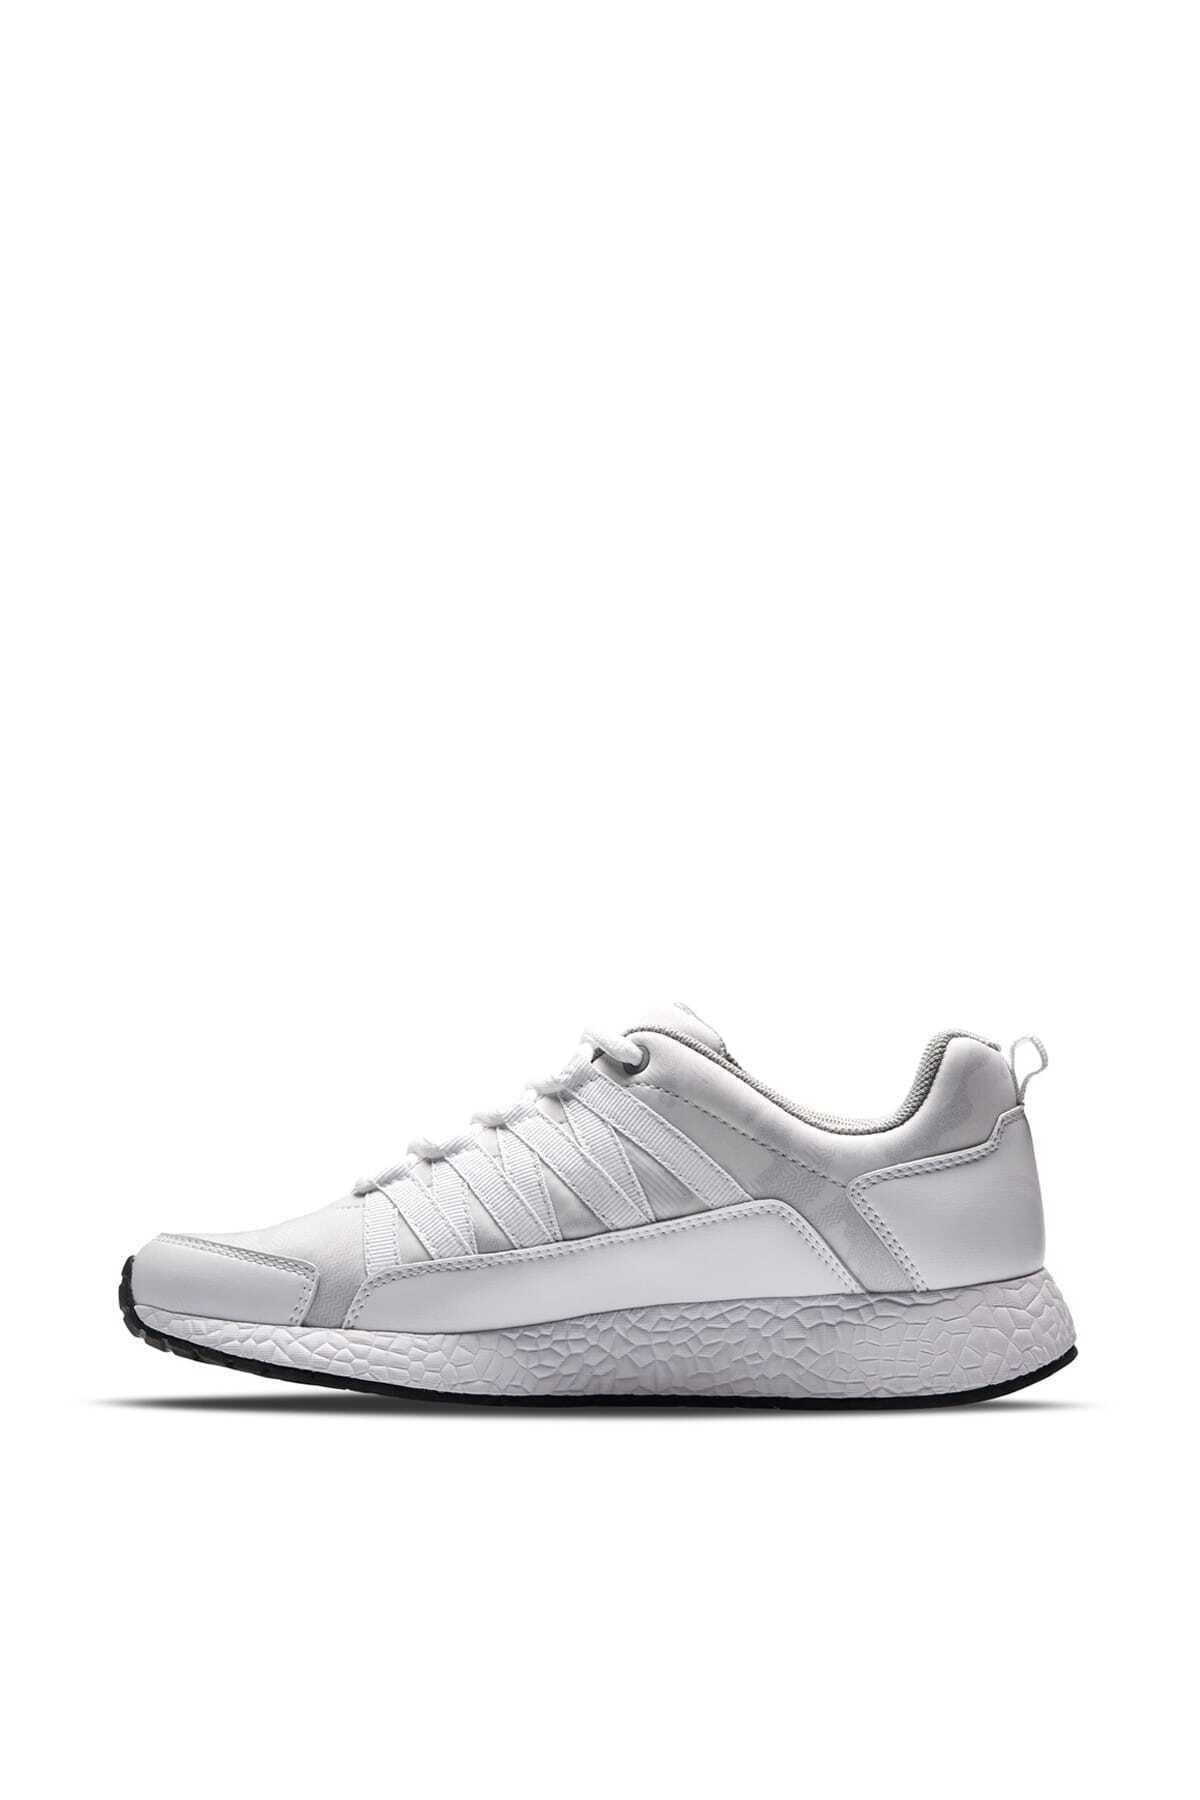 Lescon Kadın Sneaker - L-6609 Easystep - 19BAU006609G-001 2